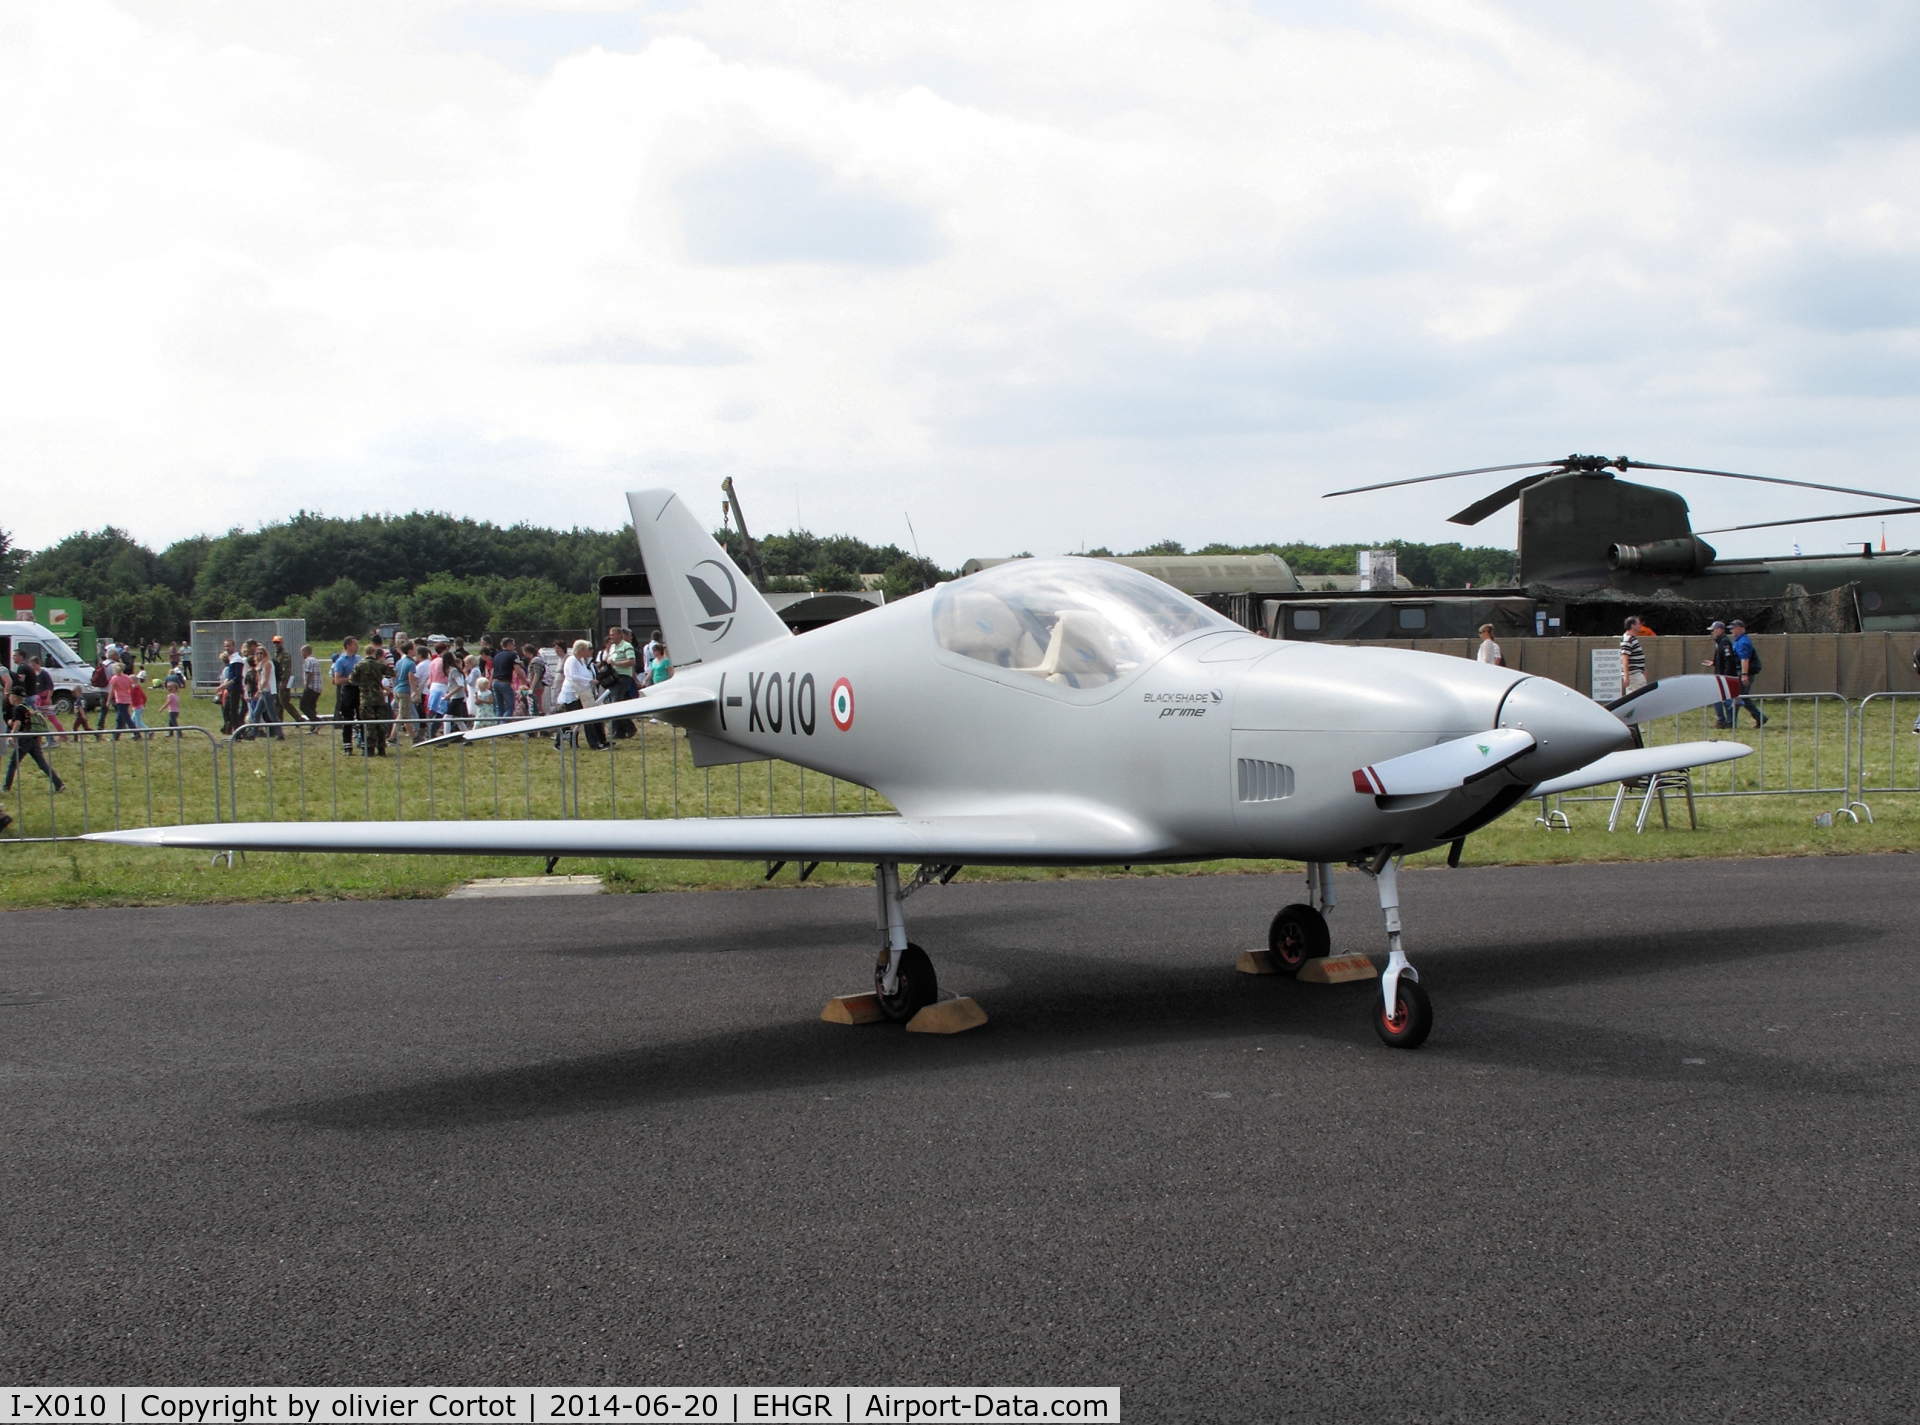 I-X010, 2014 Blackshape Prime BS-100 C/N BPU018-14, airshow 2014